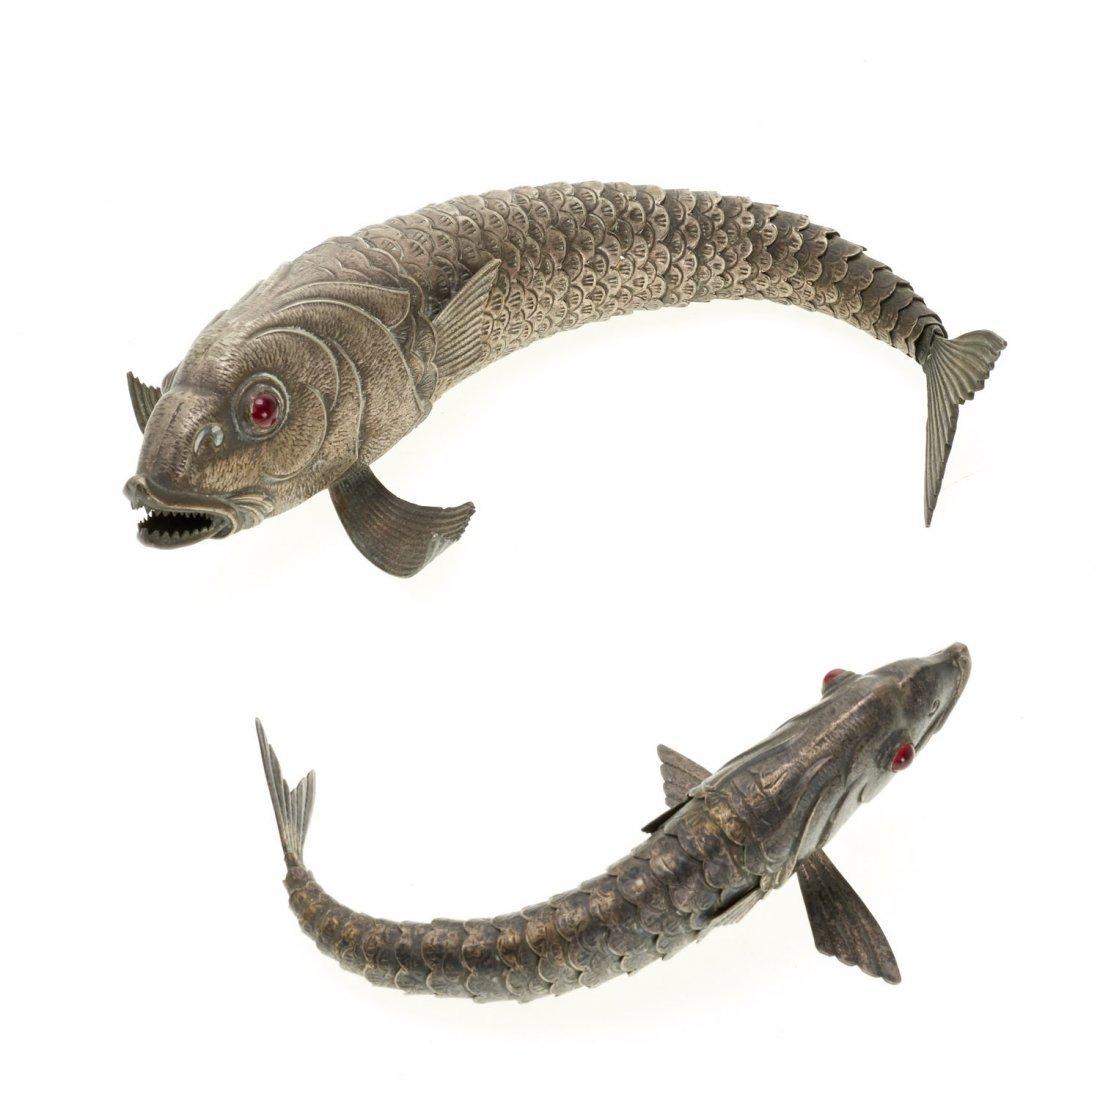 (2) Articulated alpaca alloy koi fish